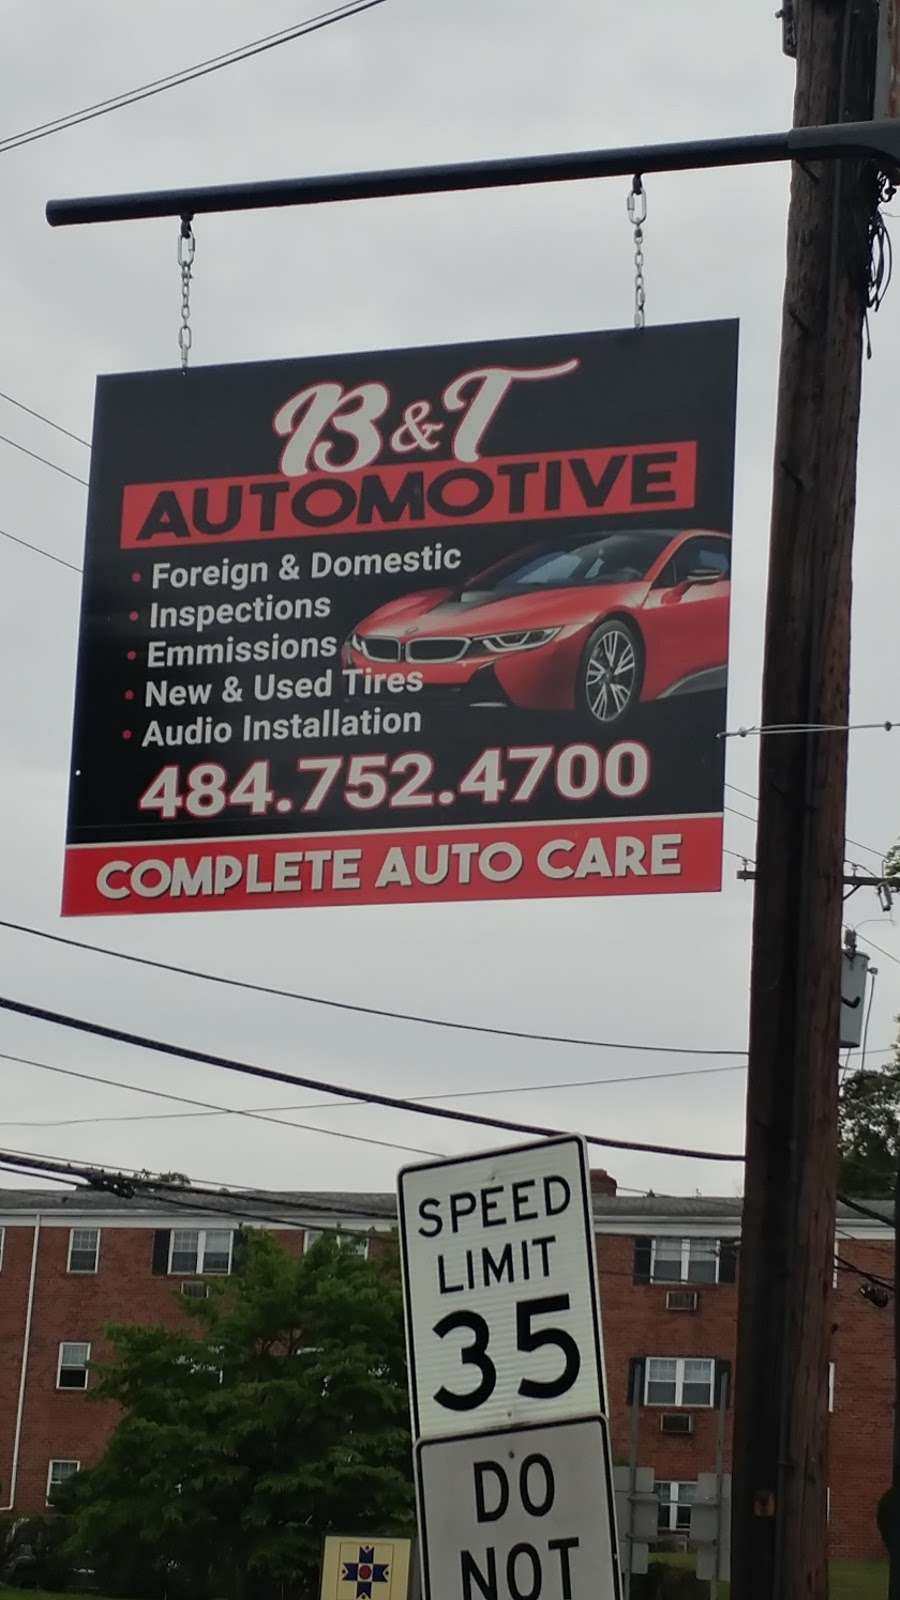 B&T Automotive - car repair    Photo 2 of 2   Address: Pottstown, PA 19465, USA   Phone: (484) 752-4700